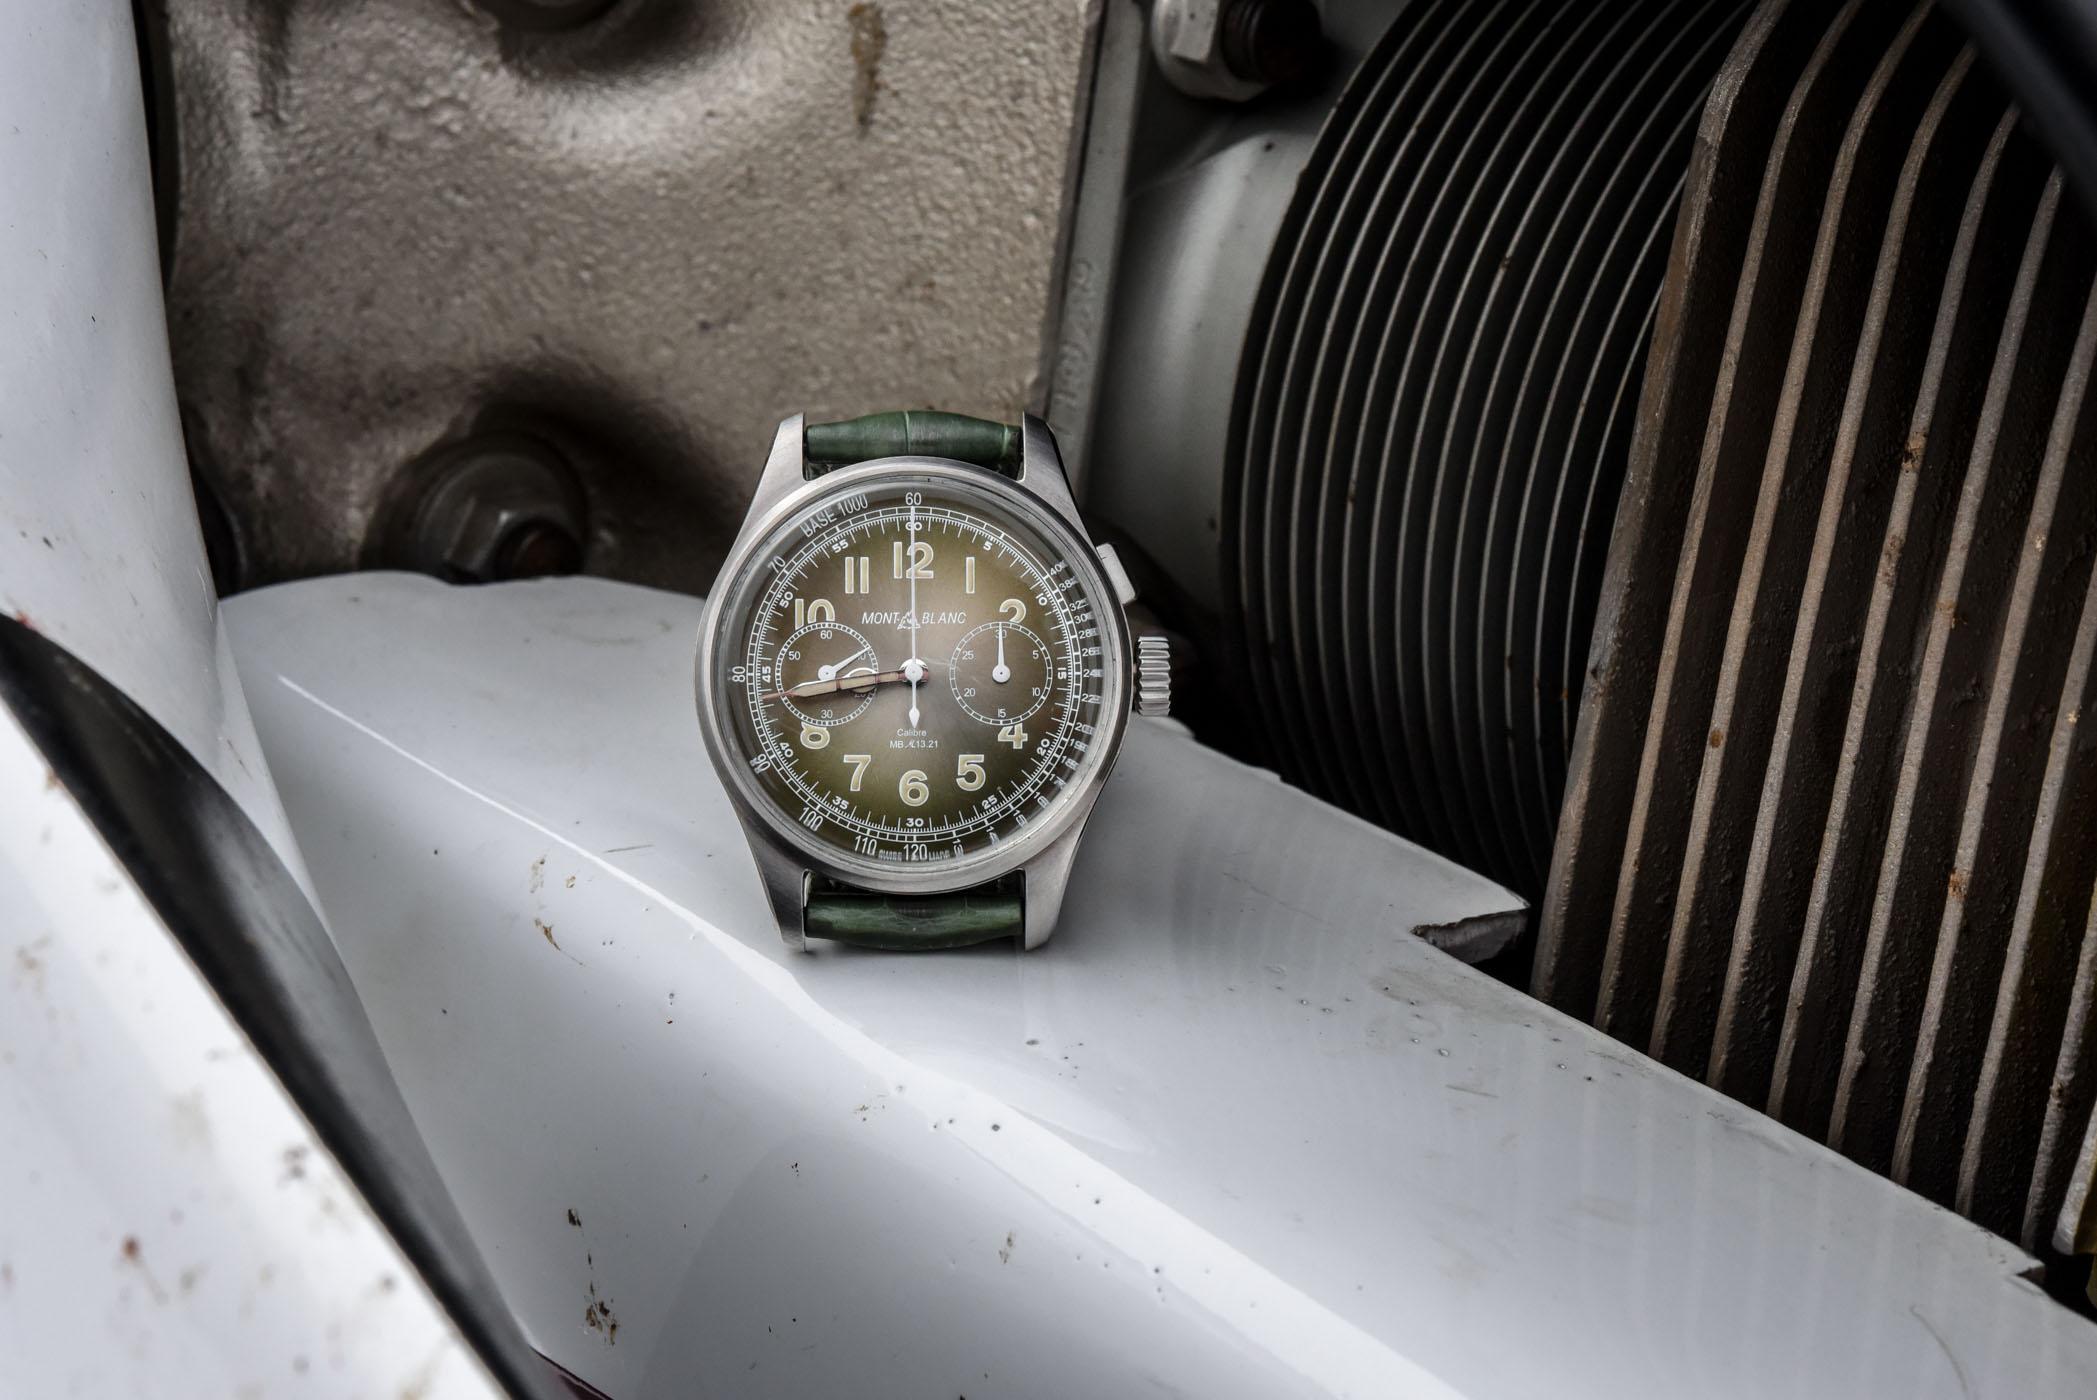 Montblanc 1858 Monopusher Chronograph LE100